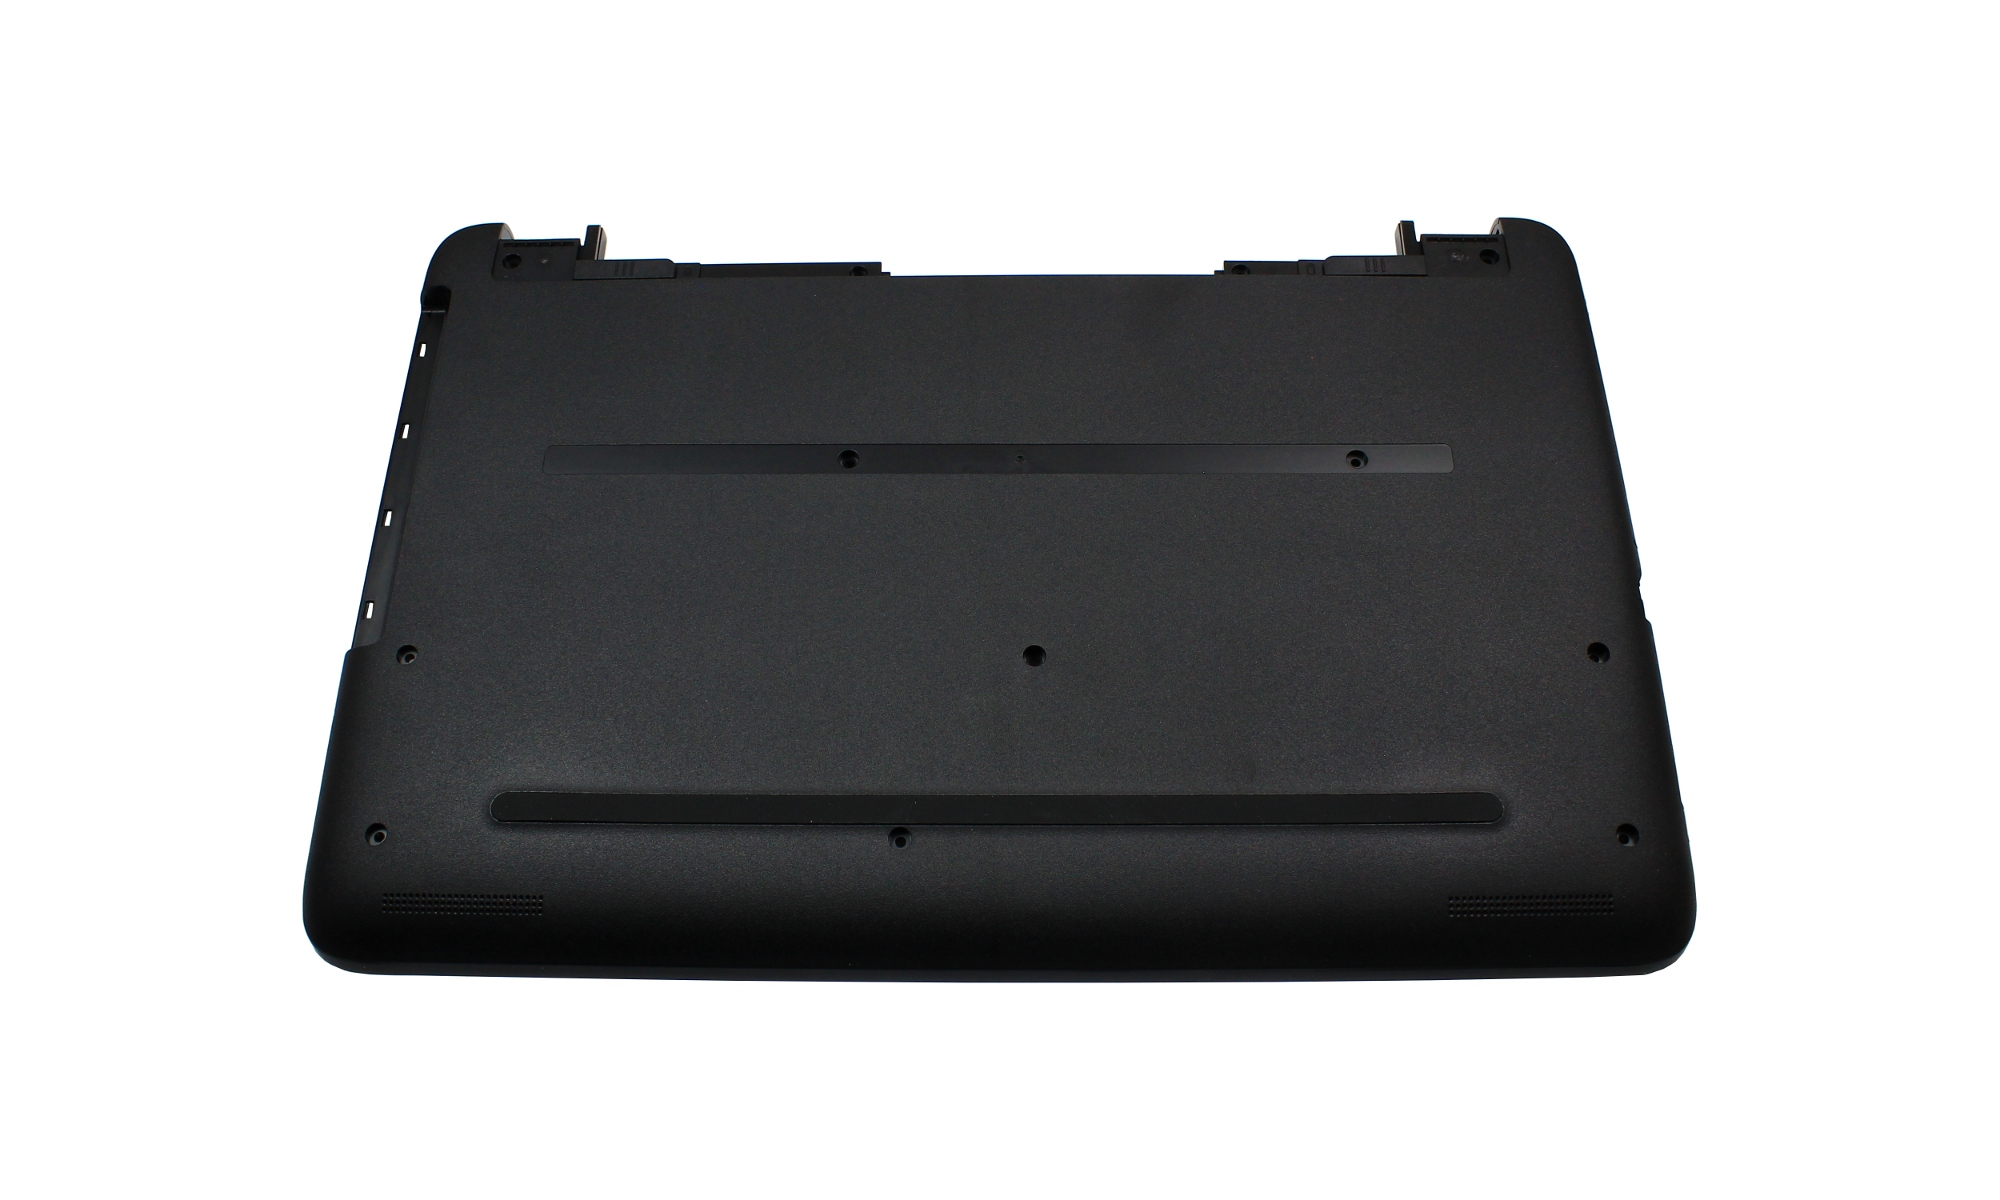 Carcasa inferioara originala HP 15-ay014ds (Touch), 15-ay014dx (Touch), 15-ay015cy (Touch), 15-ay015ds (Touch)